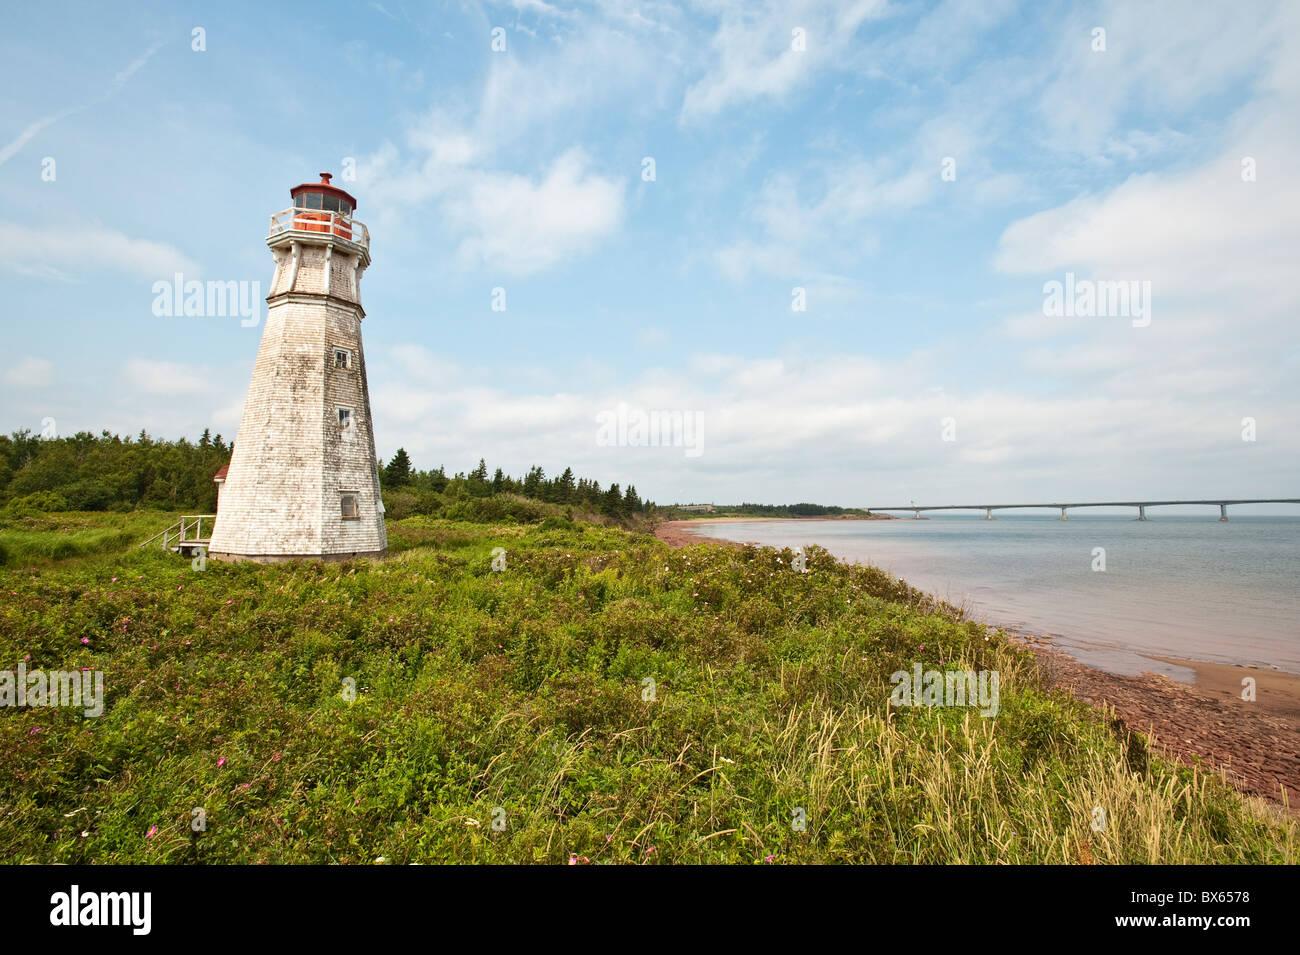 Lighthouse at Cape Jourimain National Wildlife Area, New Brunswick, Canada, North America - Stock Image